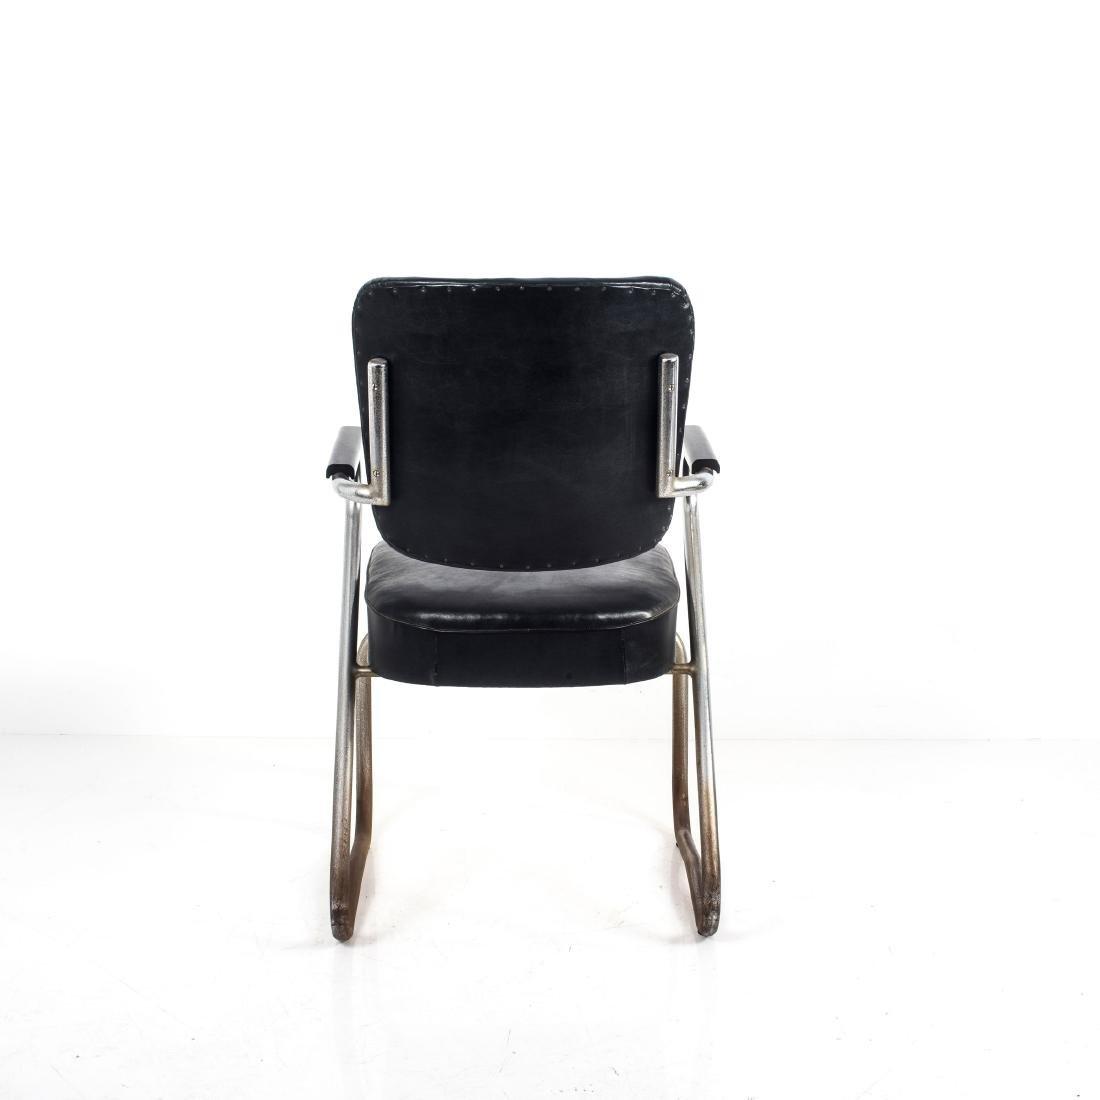 Tubular steel chair, c. 1935 - 7